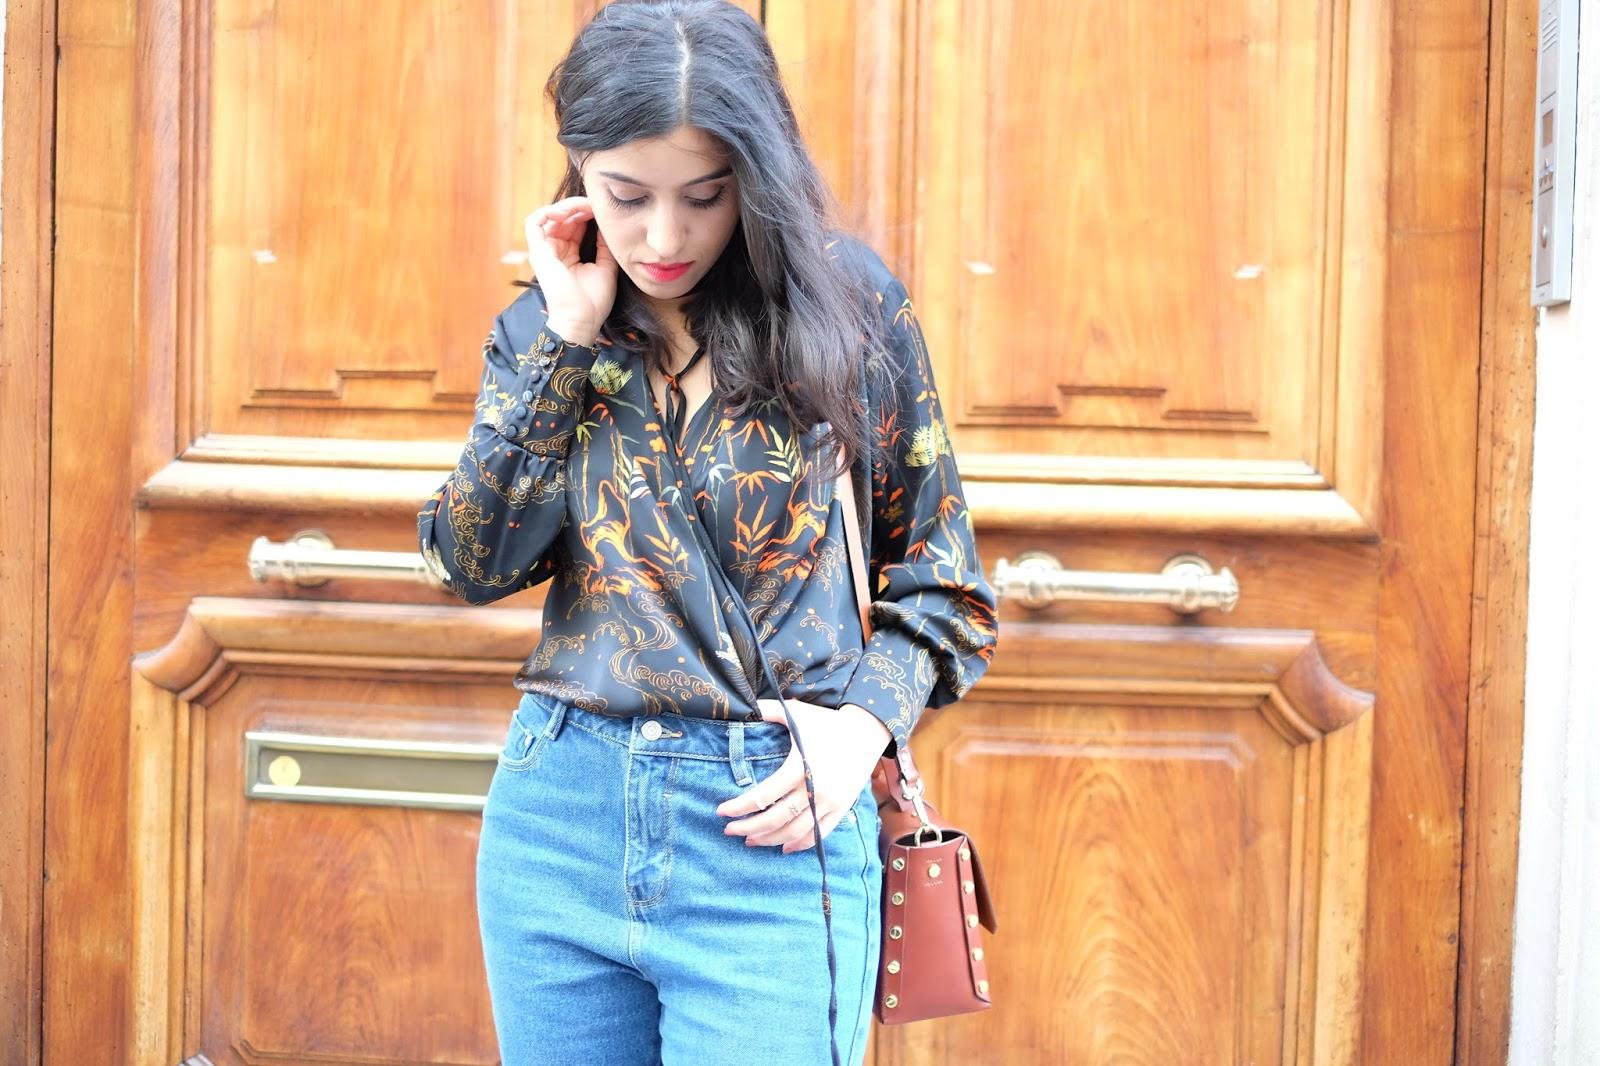 blog mode, blogueuse mode, blog mode lyon, modeuse, amenidaily, sac sandro, french blogger, jean mom, mom jean